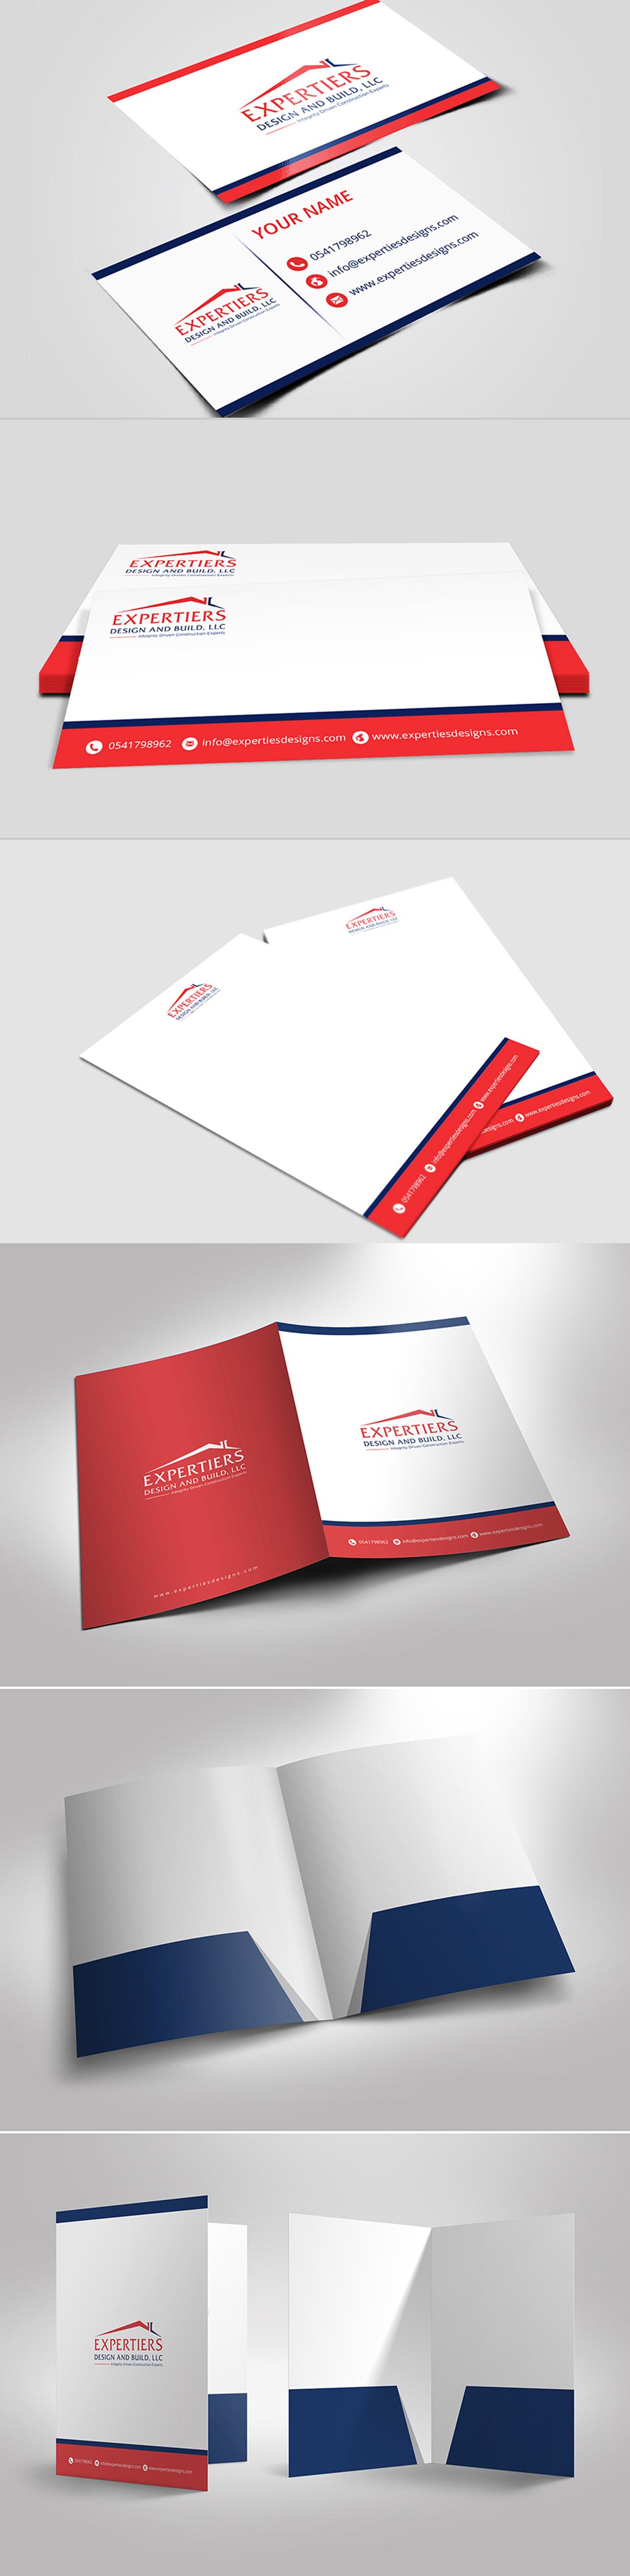 artcore-creative-logo-identity-design-expertiers3